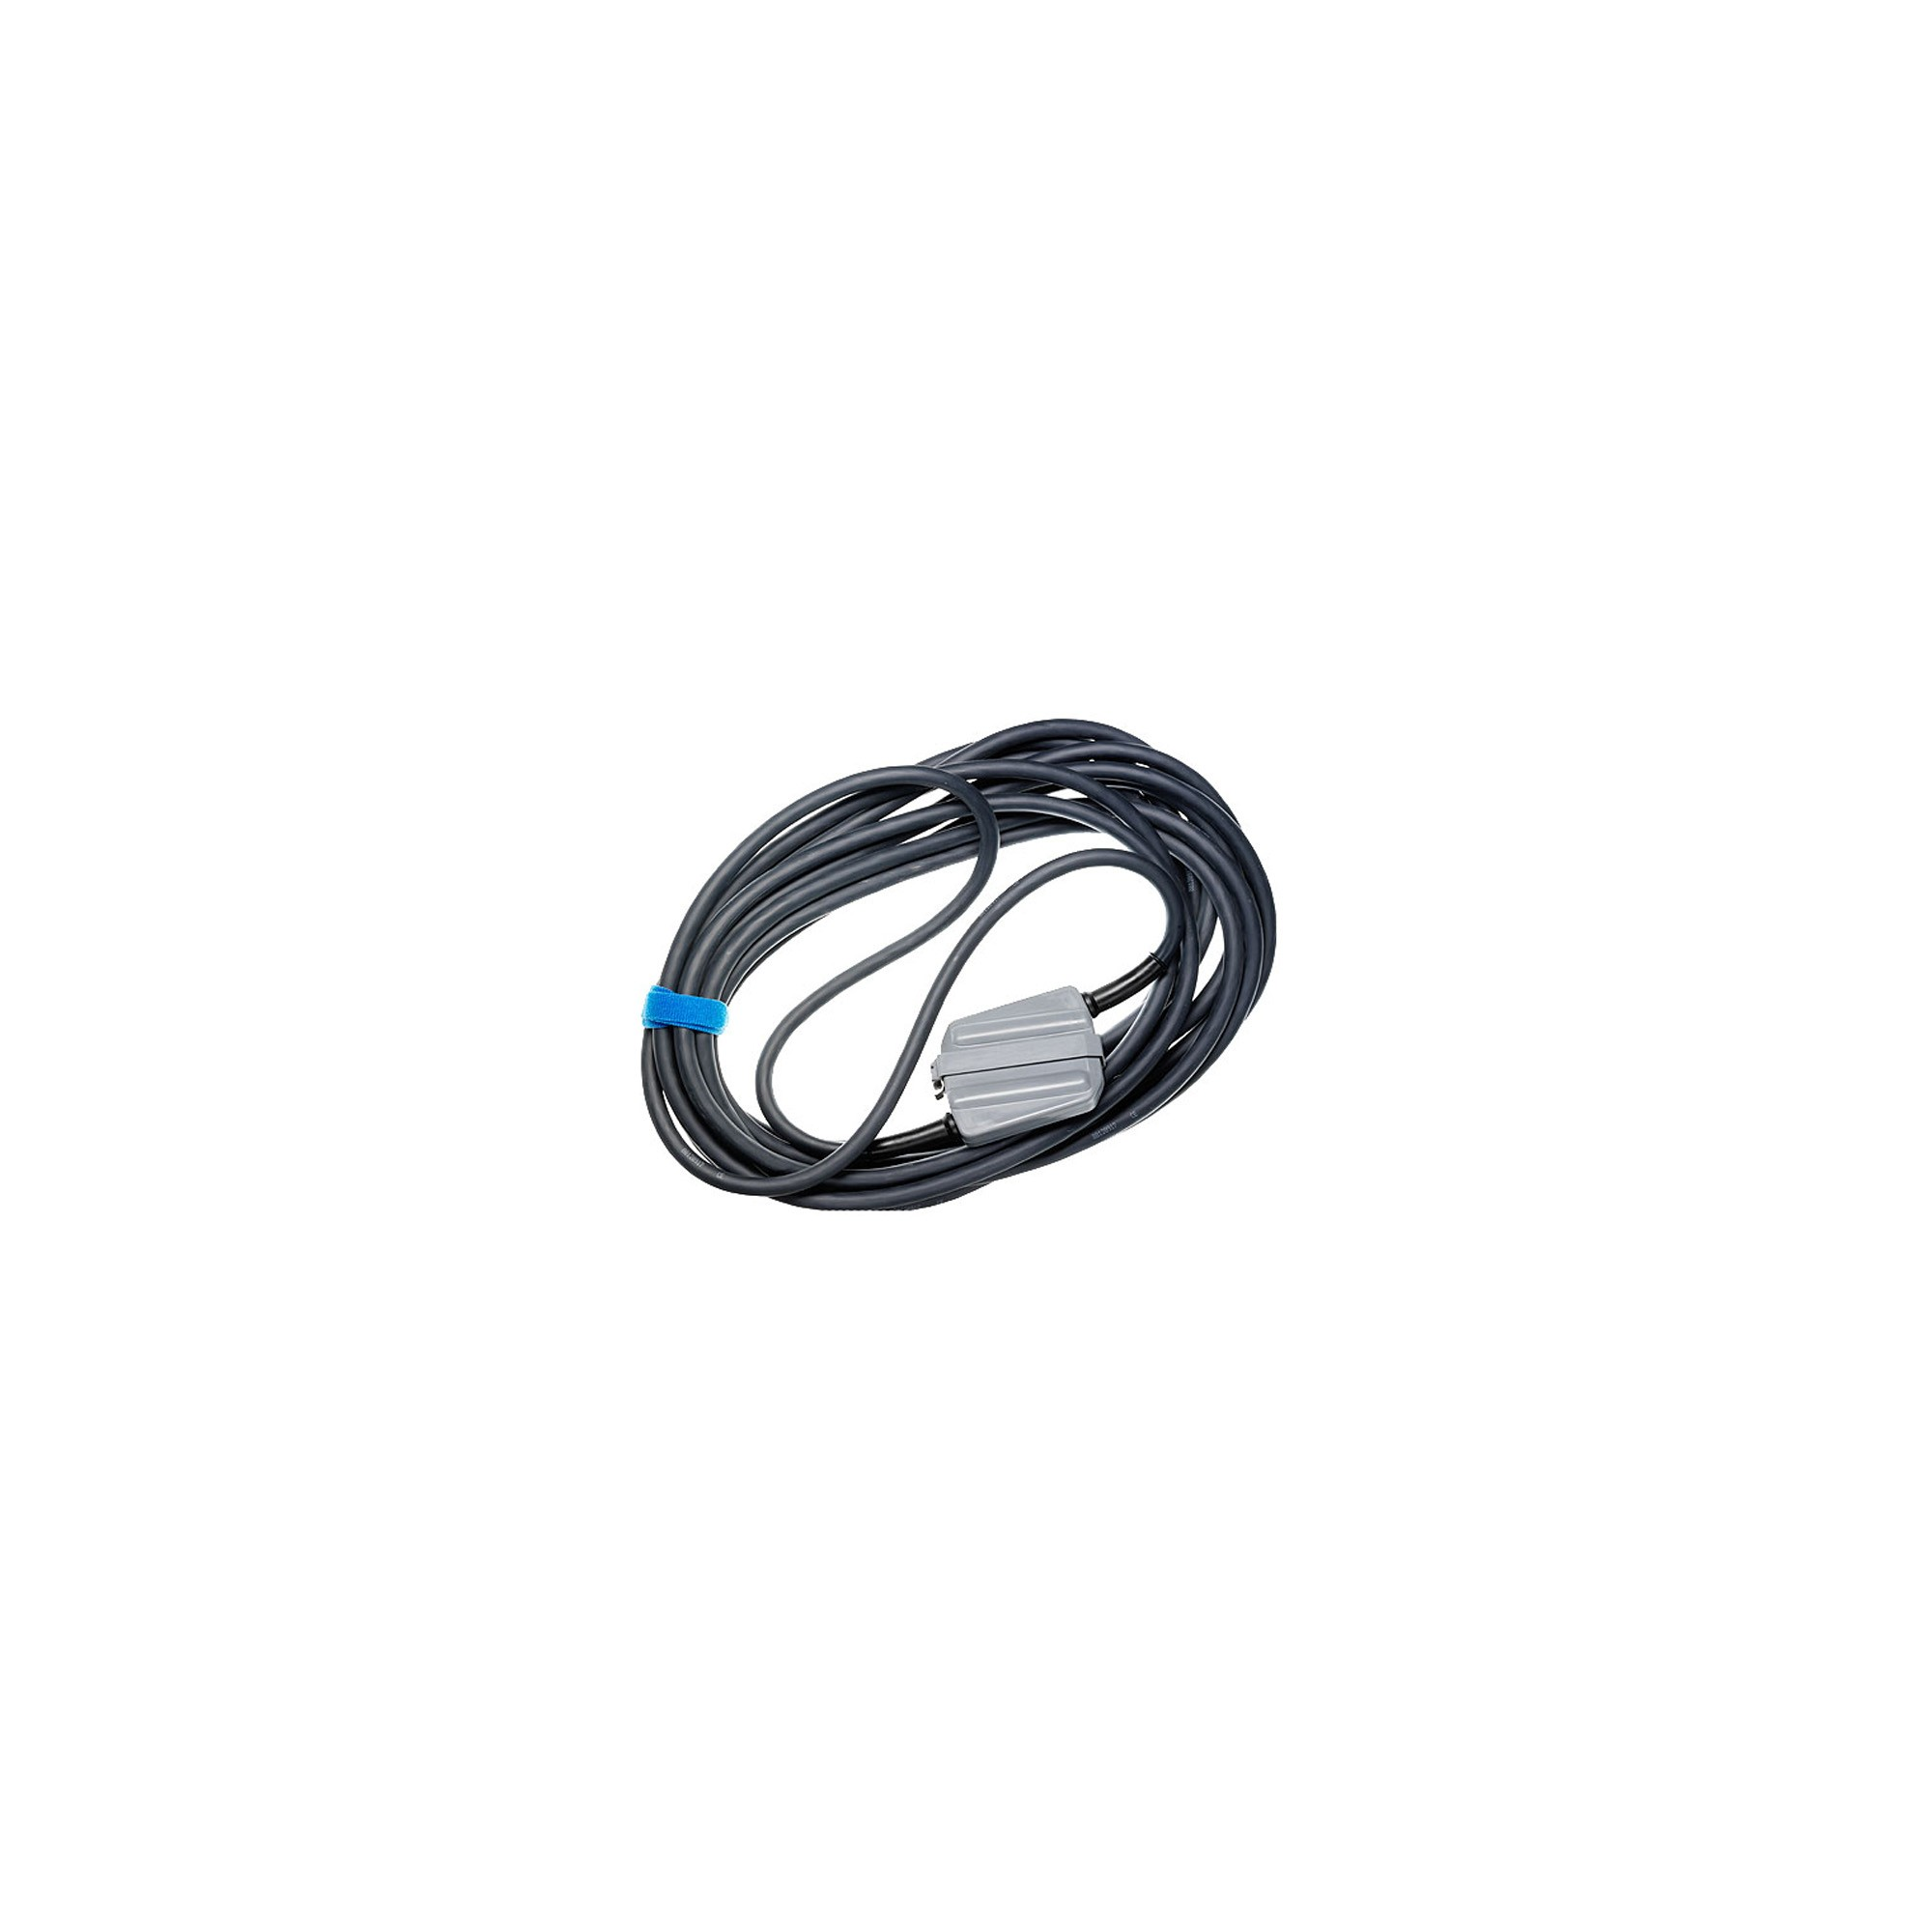 Broncolor Lamp extension cable 3200J available to rent / verhuur / location at 50.8 Studio • Belgïe, Belgique, Belgium, Broncolor, Huur, Location, Louer, Photo, Rent, Rental, Softbox, Strobe, Studio, Verhuur, Video